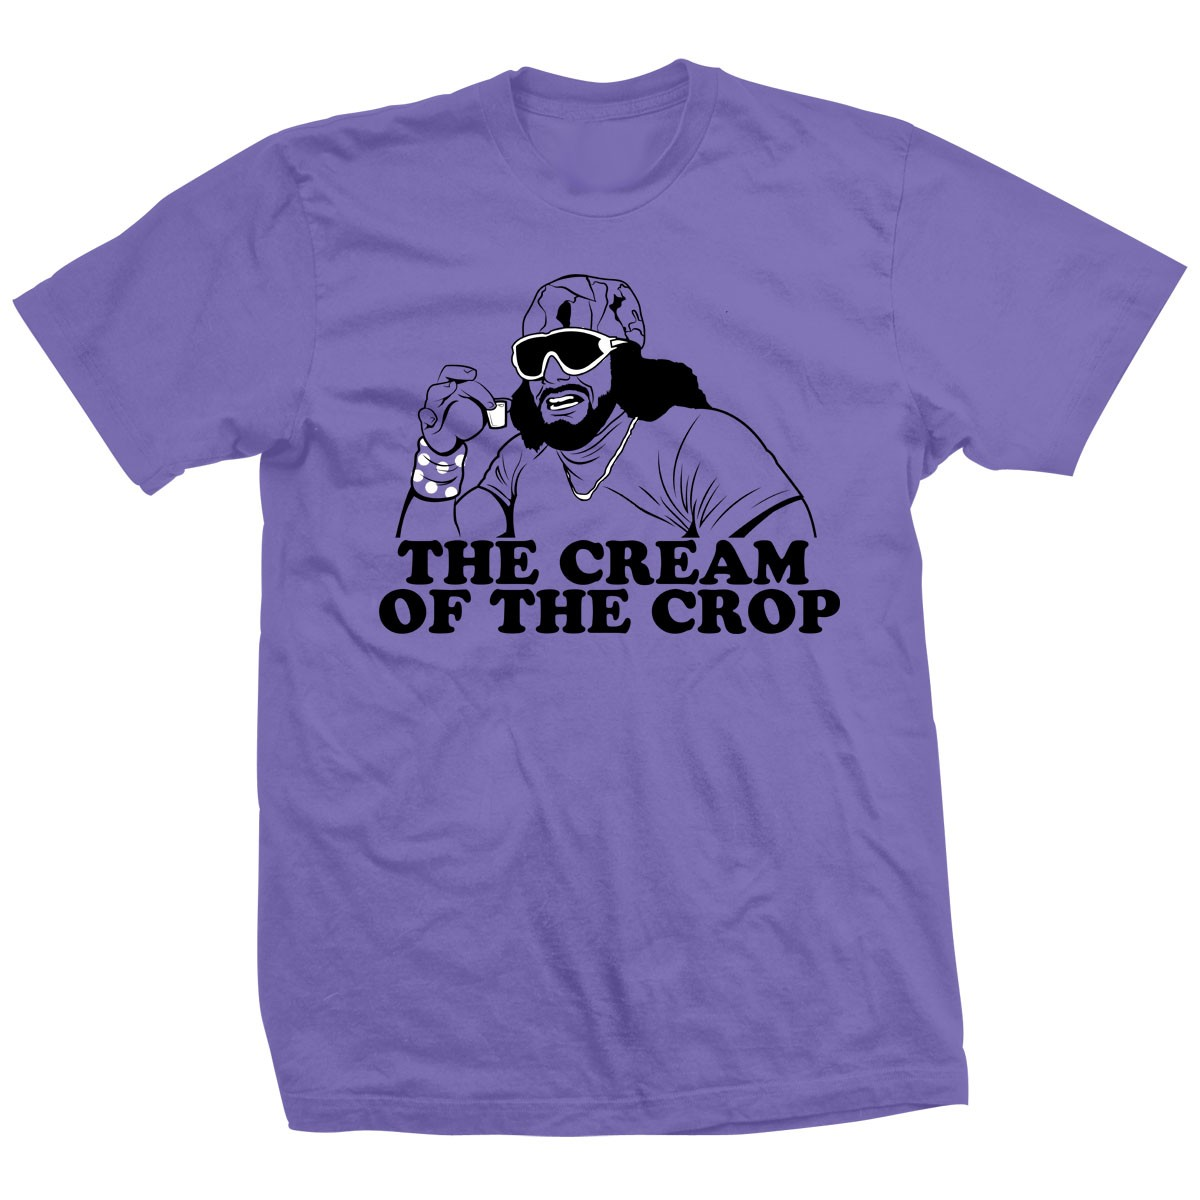 macho man cream of the crop quote